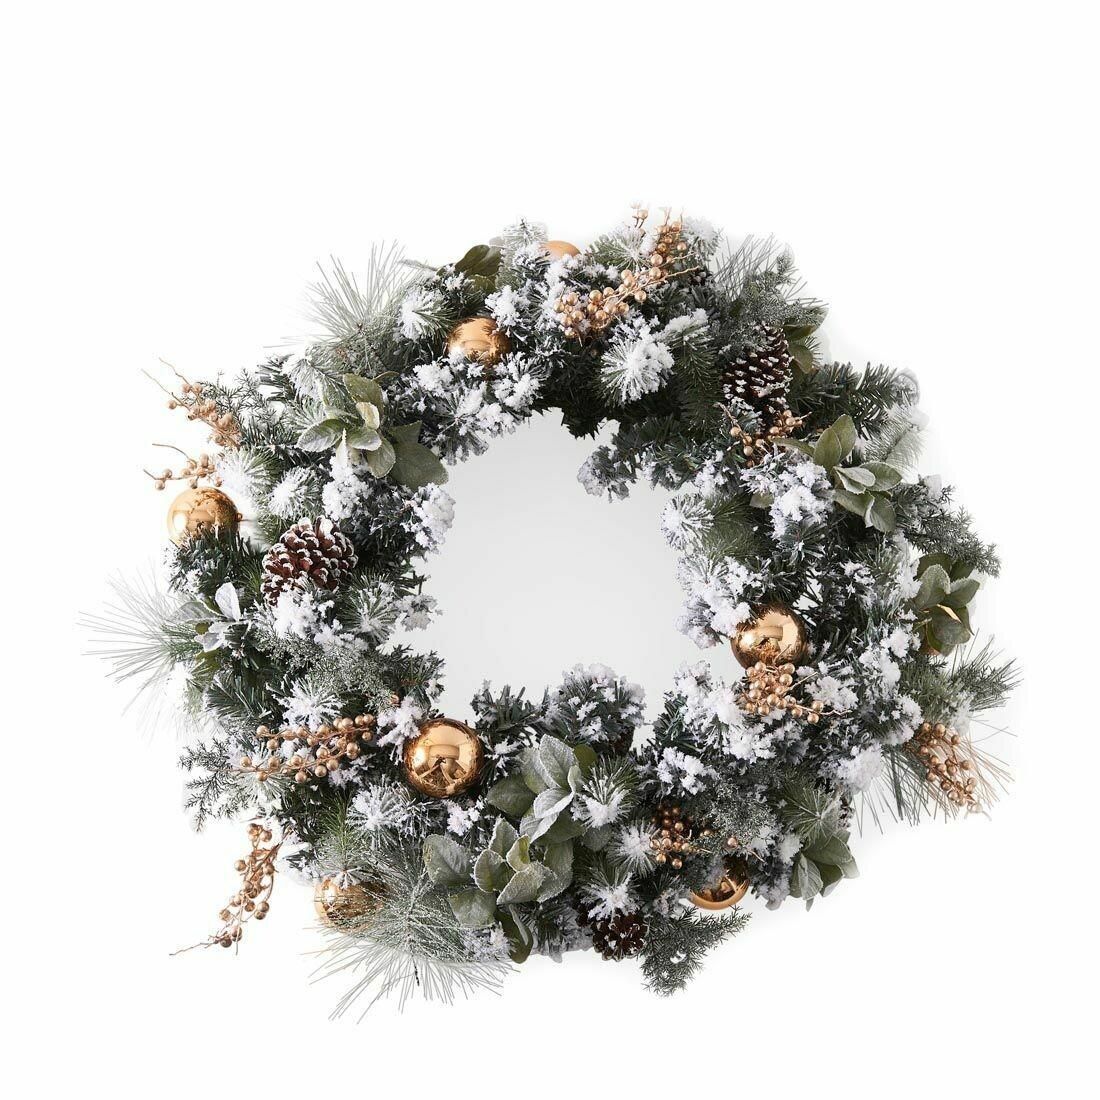 MERRY CHRISTMAS WREATH GOLD 100 cm